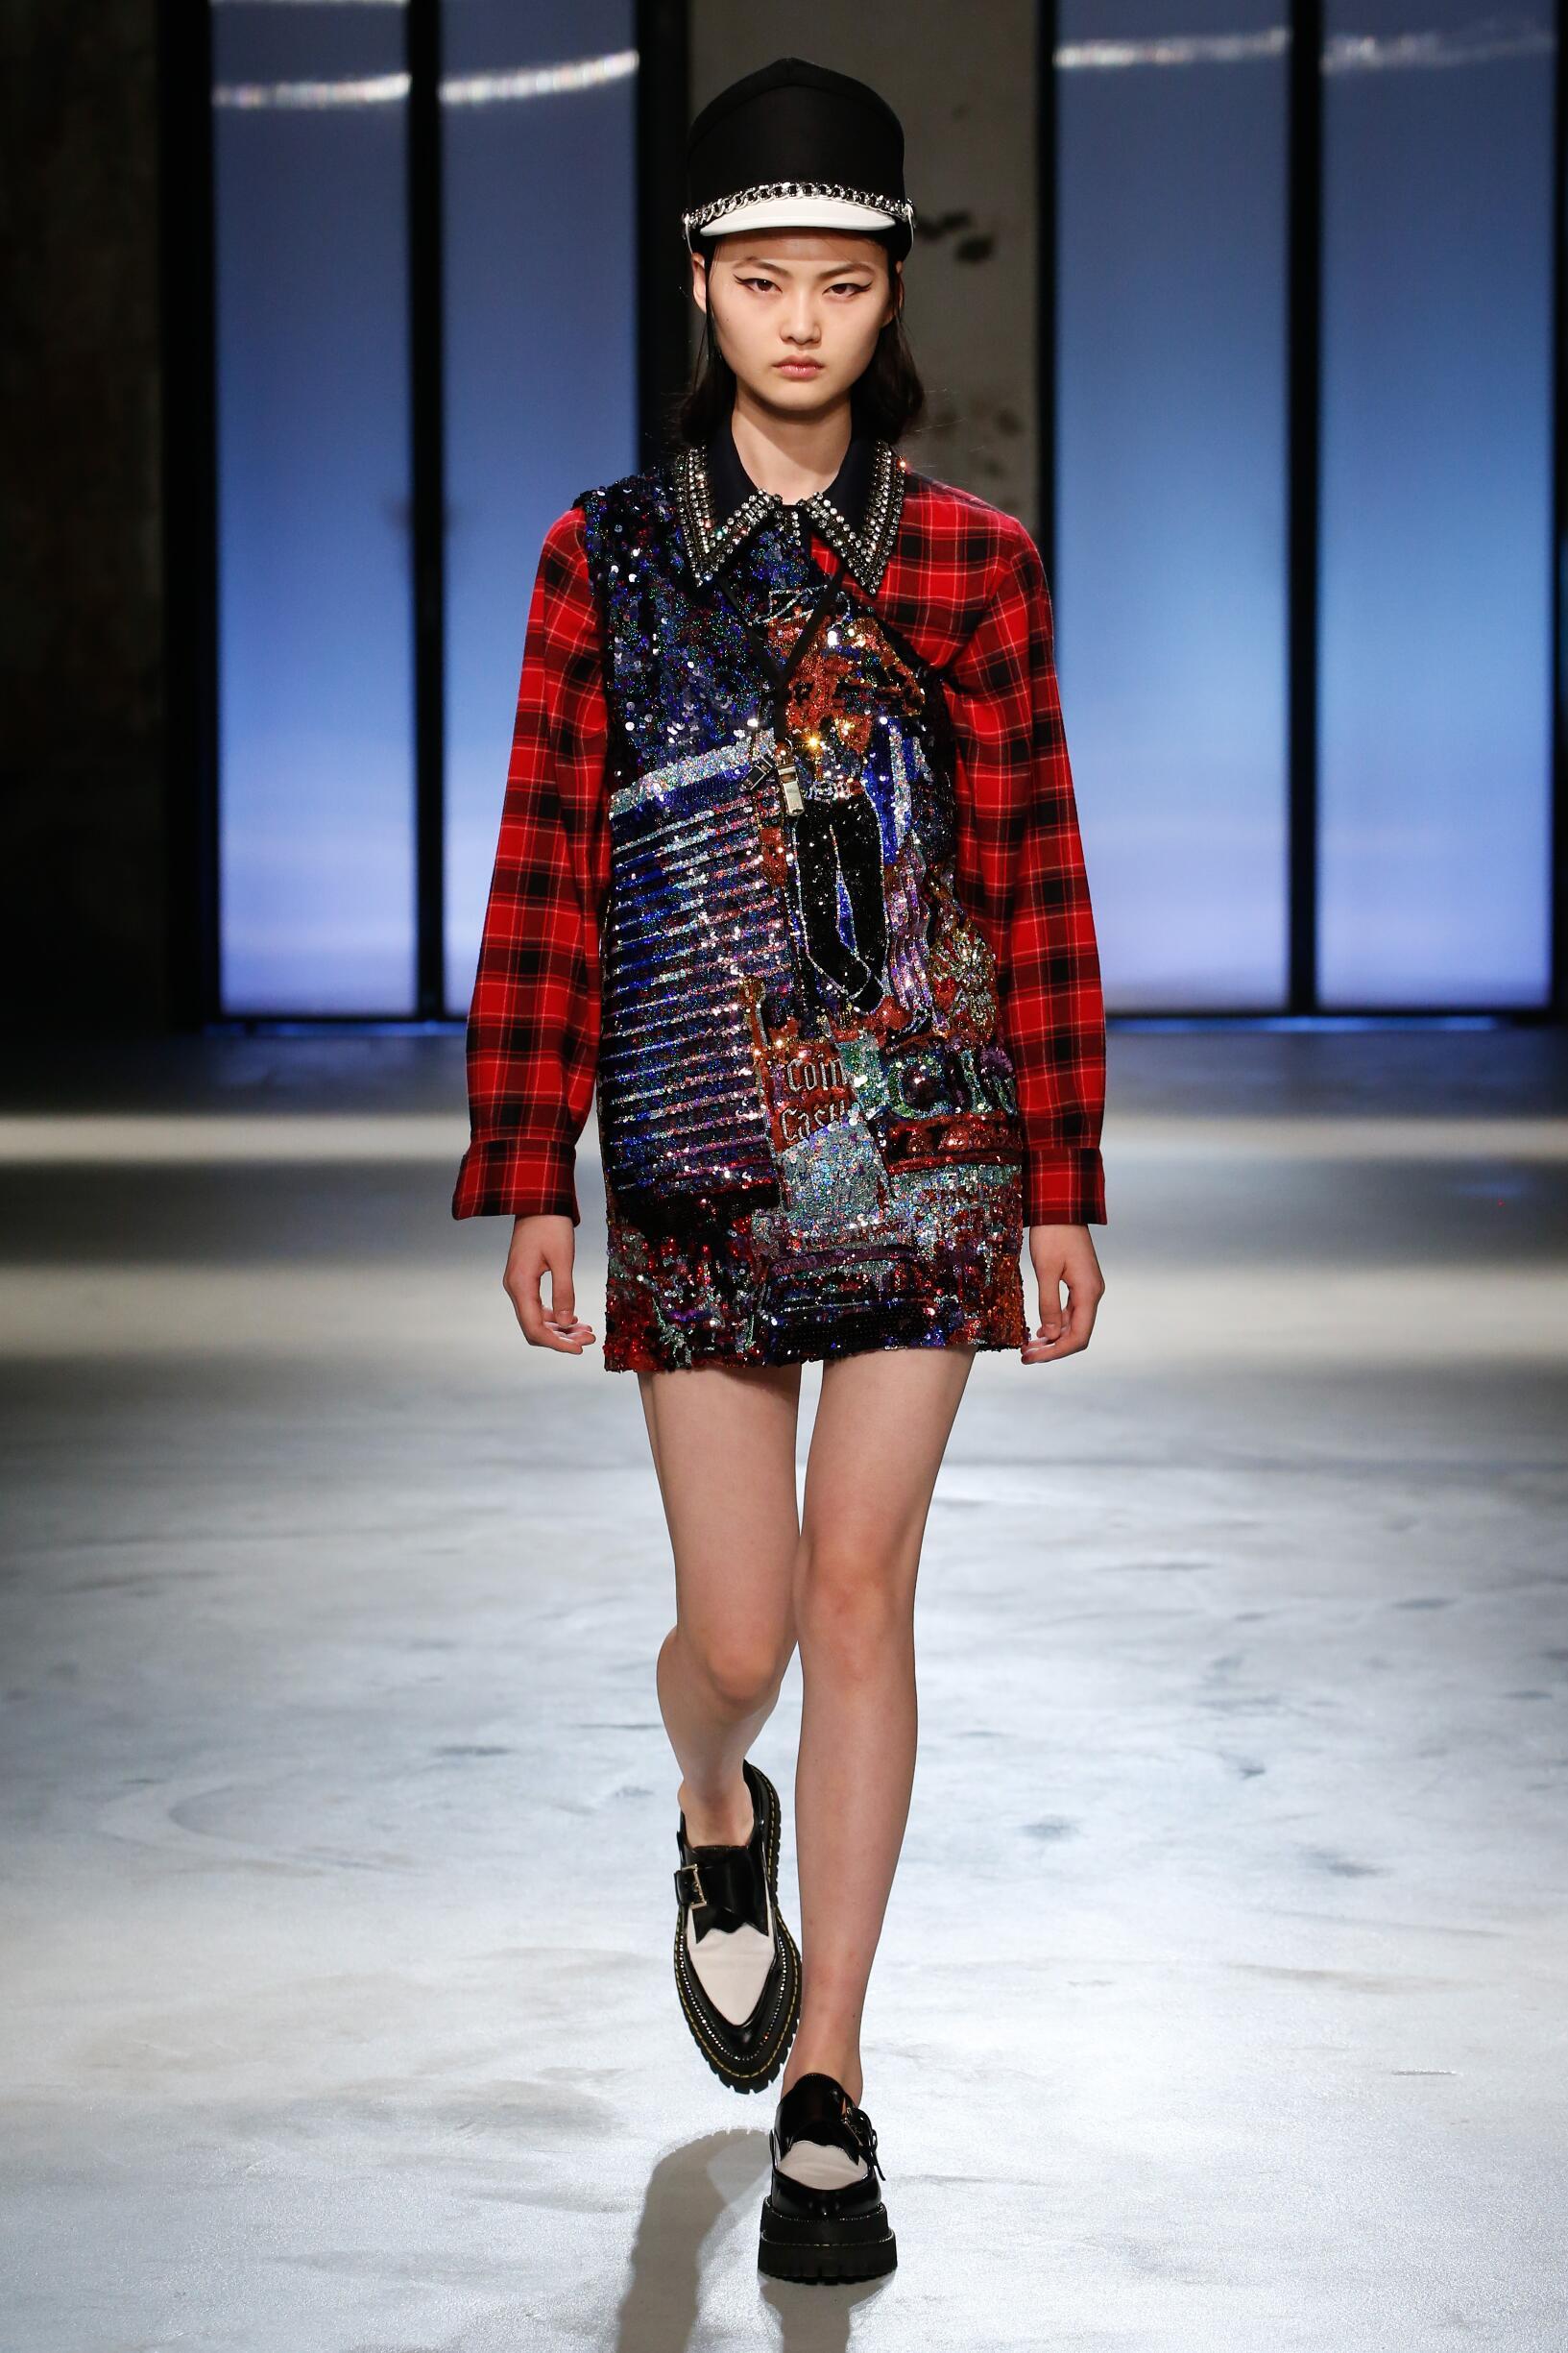 2018 Catwalk N°21 Woman Fashion Show Winter